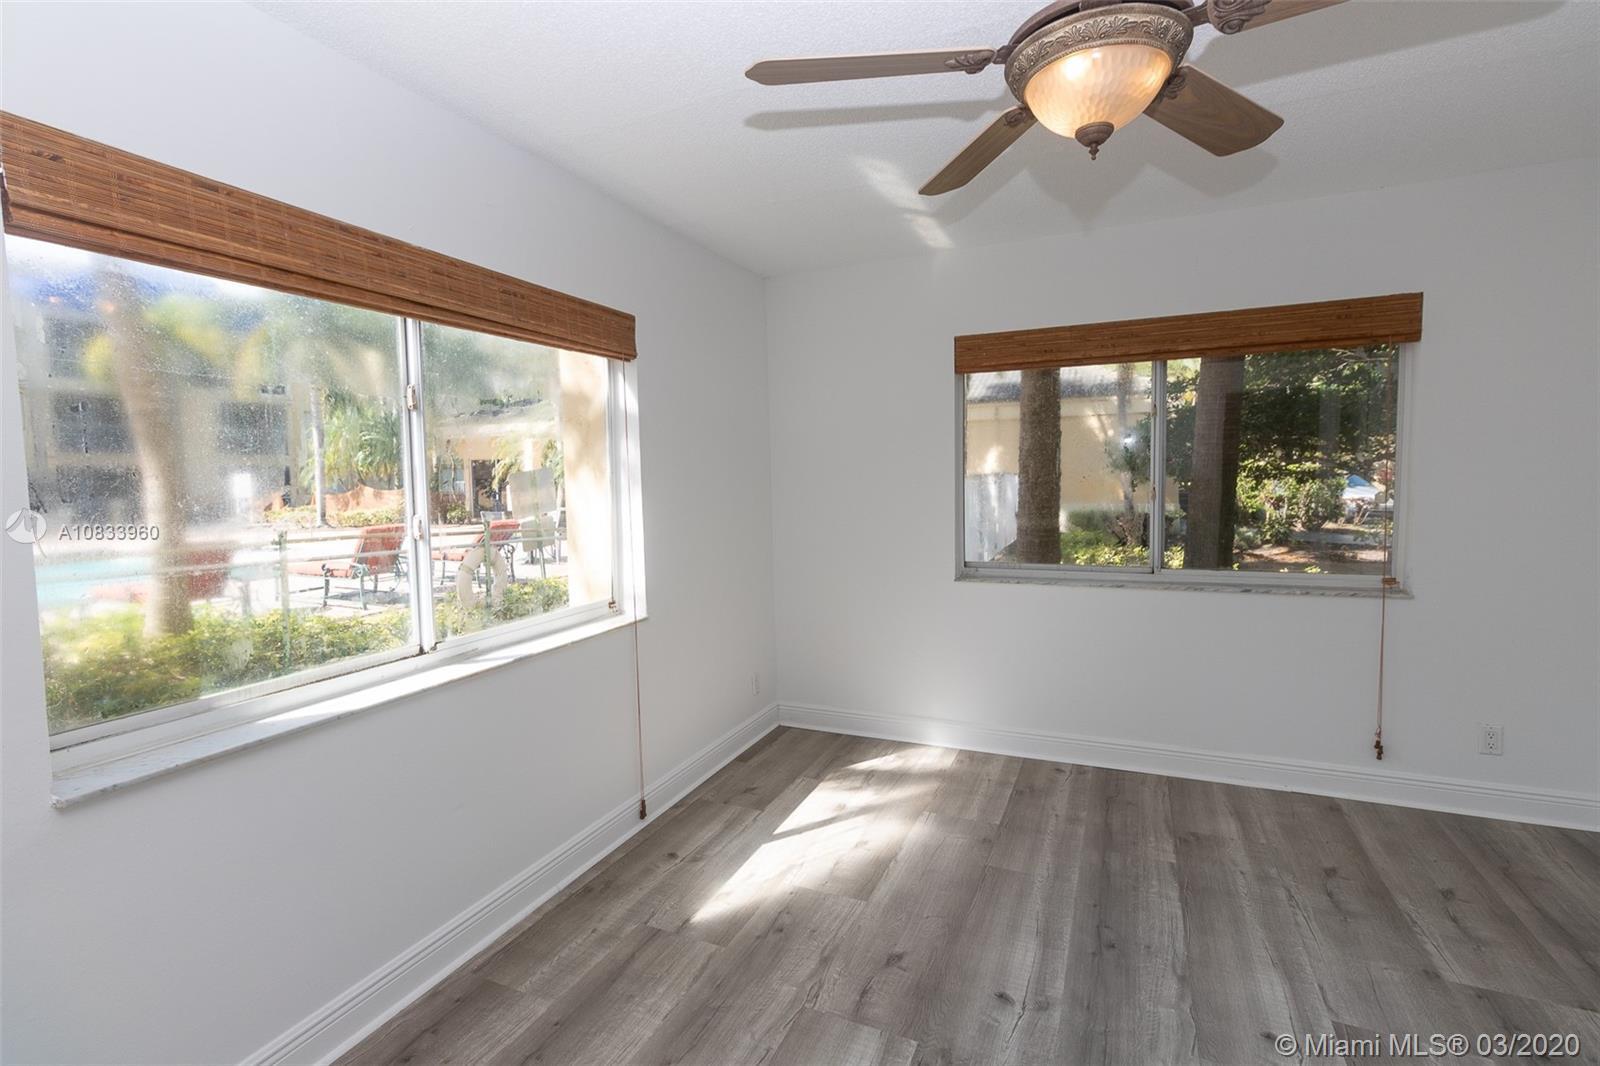 5740 Rock Island Rd #276, Tamarac, FL 33319 - Tamarac, FL real estate listing